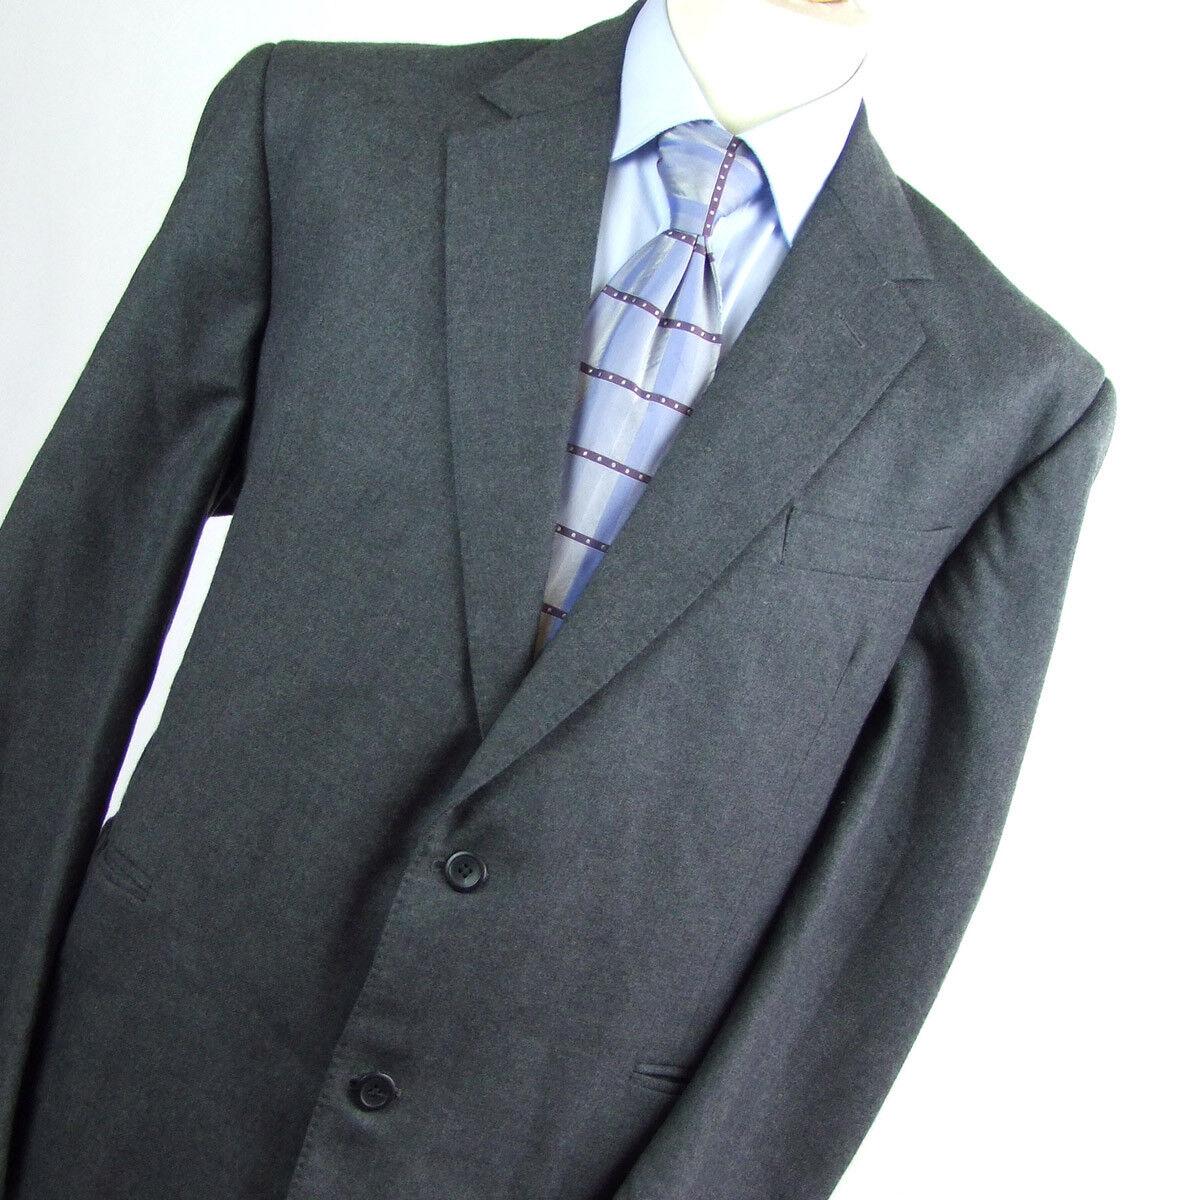 Barney Goodman  Herren Grau Suit 44/40 Regular Single Breasted Wool Plain